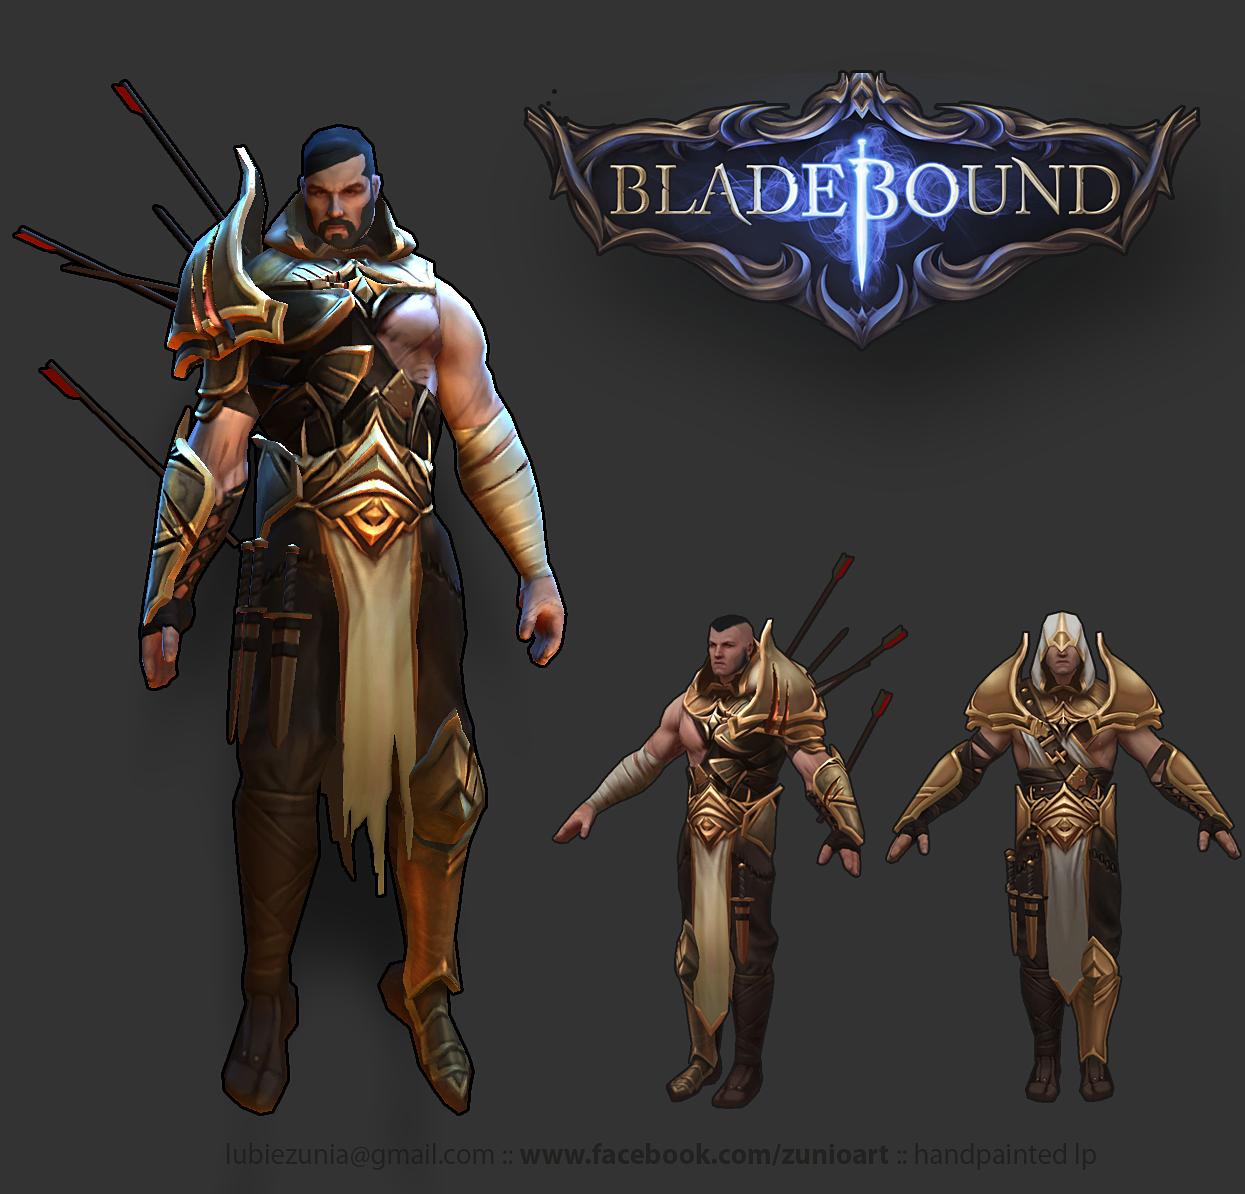 Bladebound Handpainted Light Armor www facebook com/zunioart